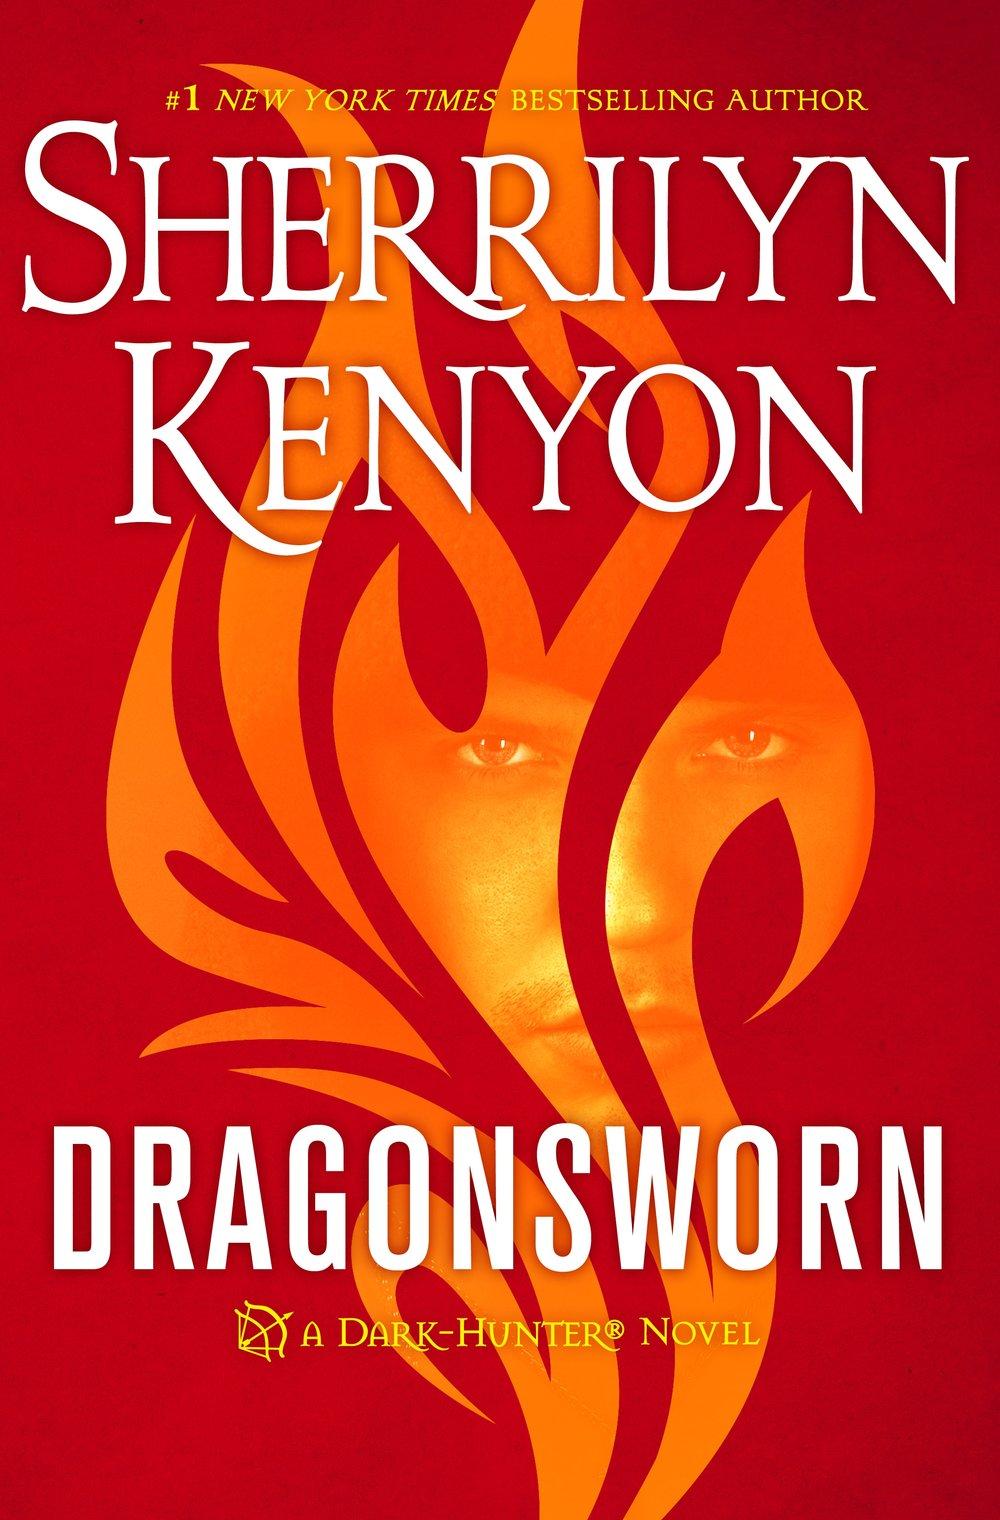 KenyonDragonsworn cover.jpg